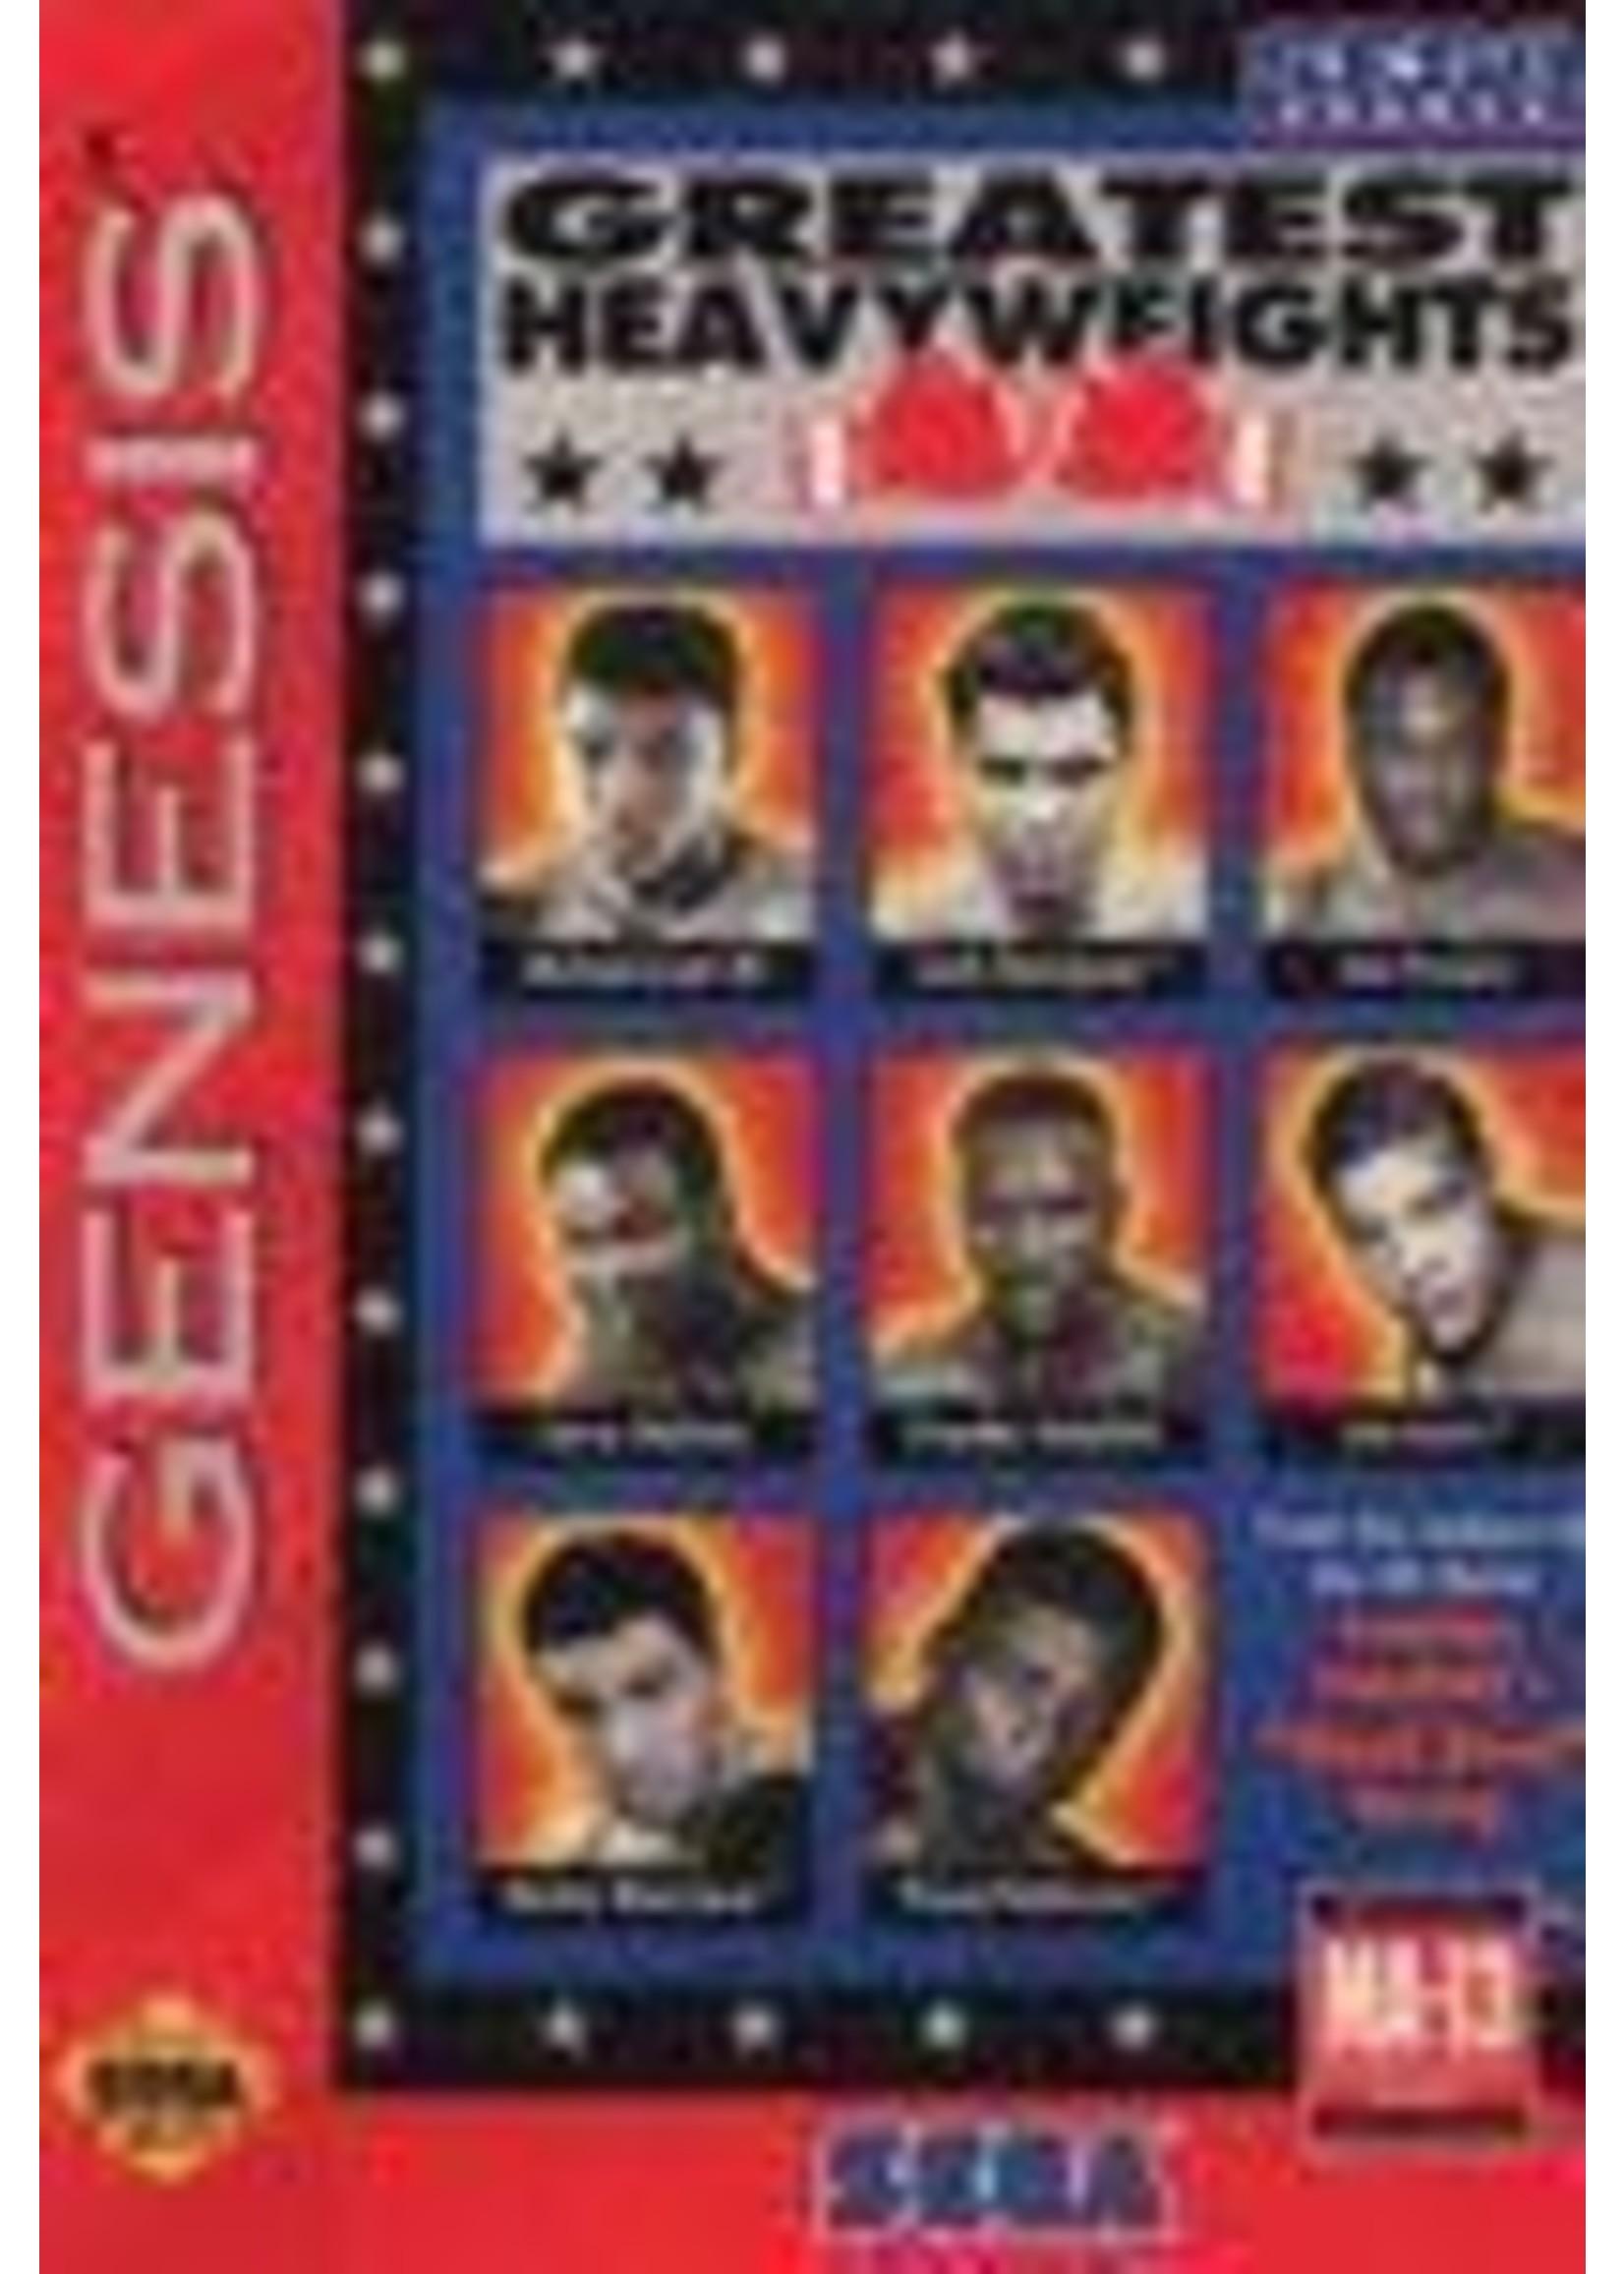 Greatest Heavyweights Sega Genesis